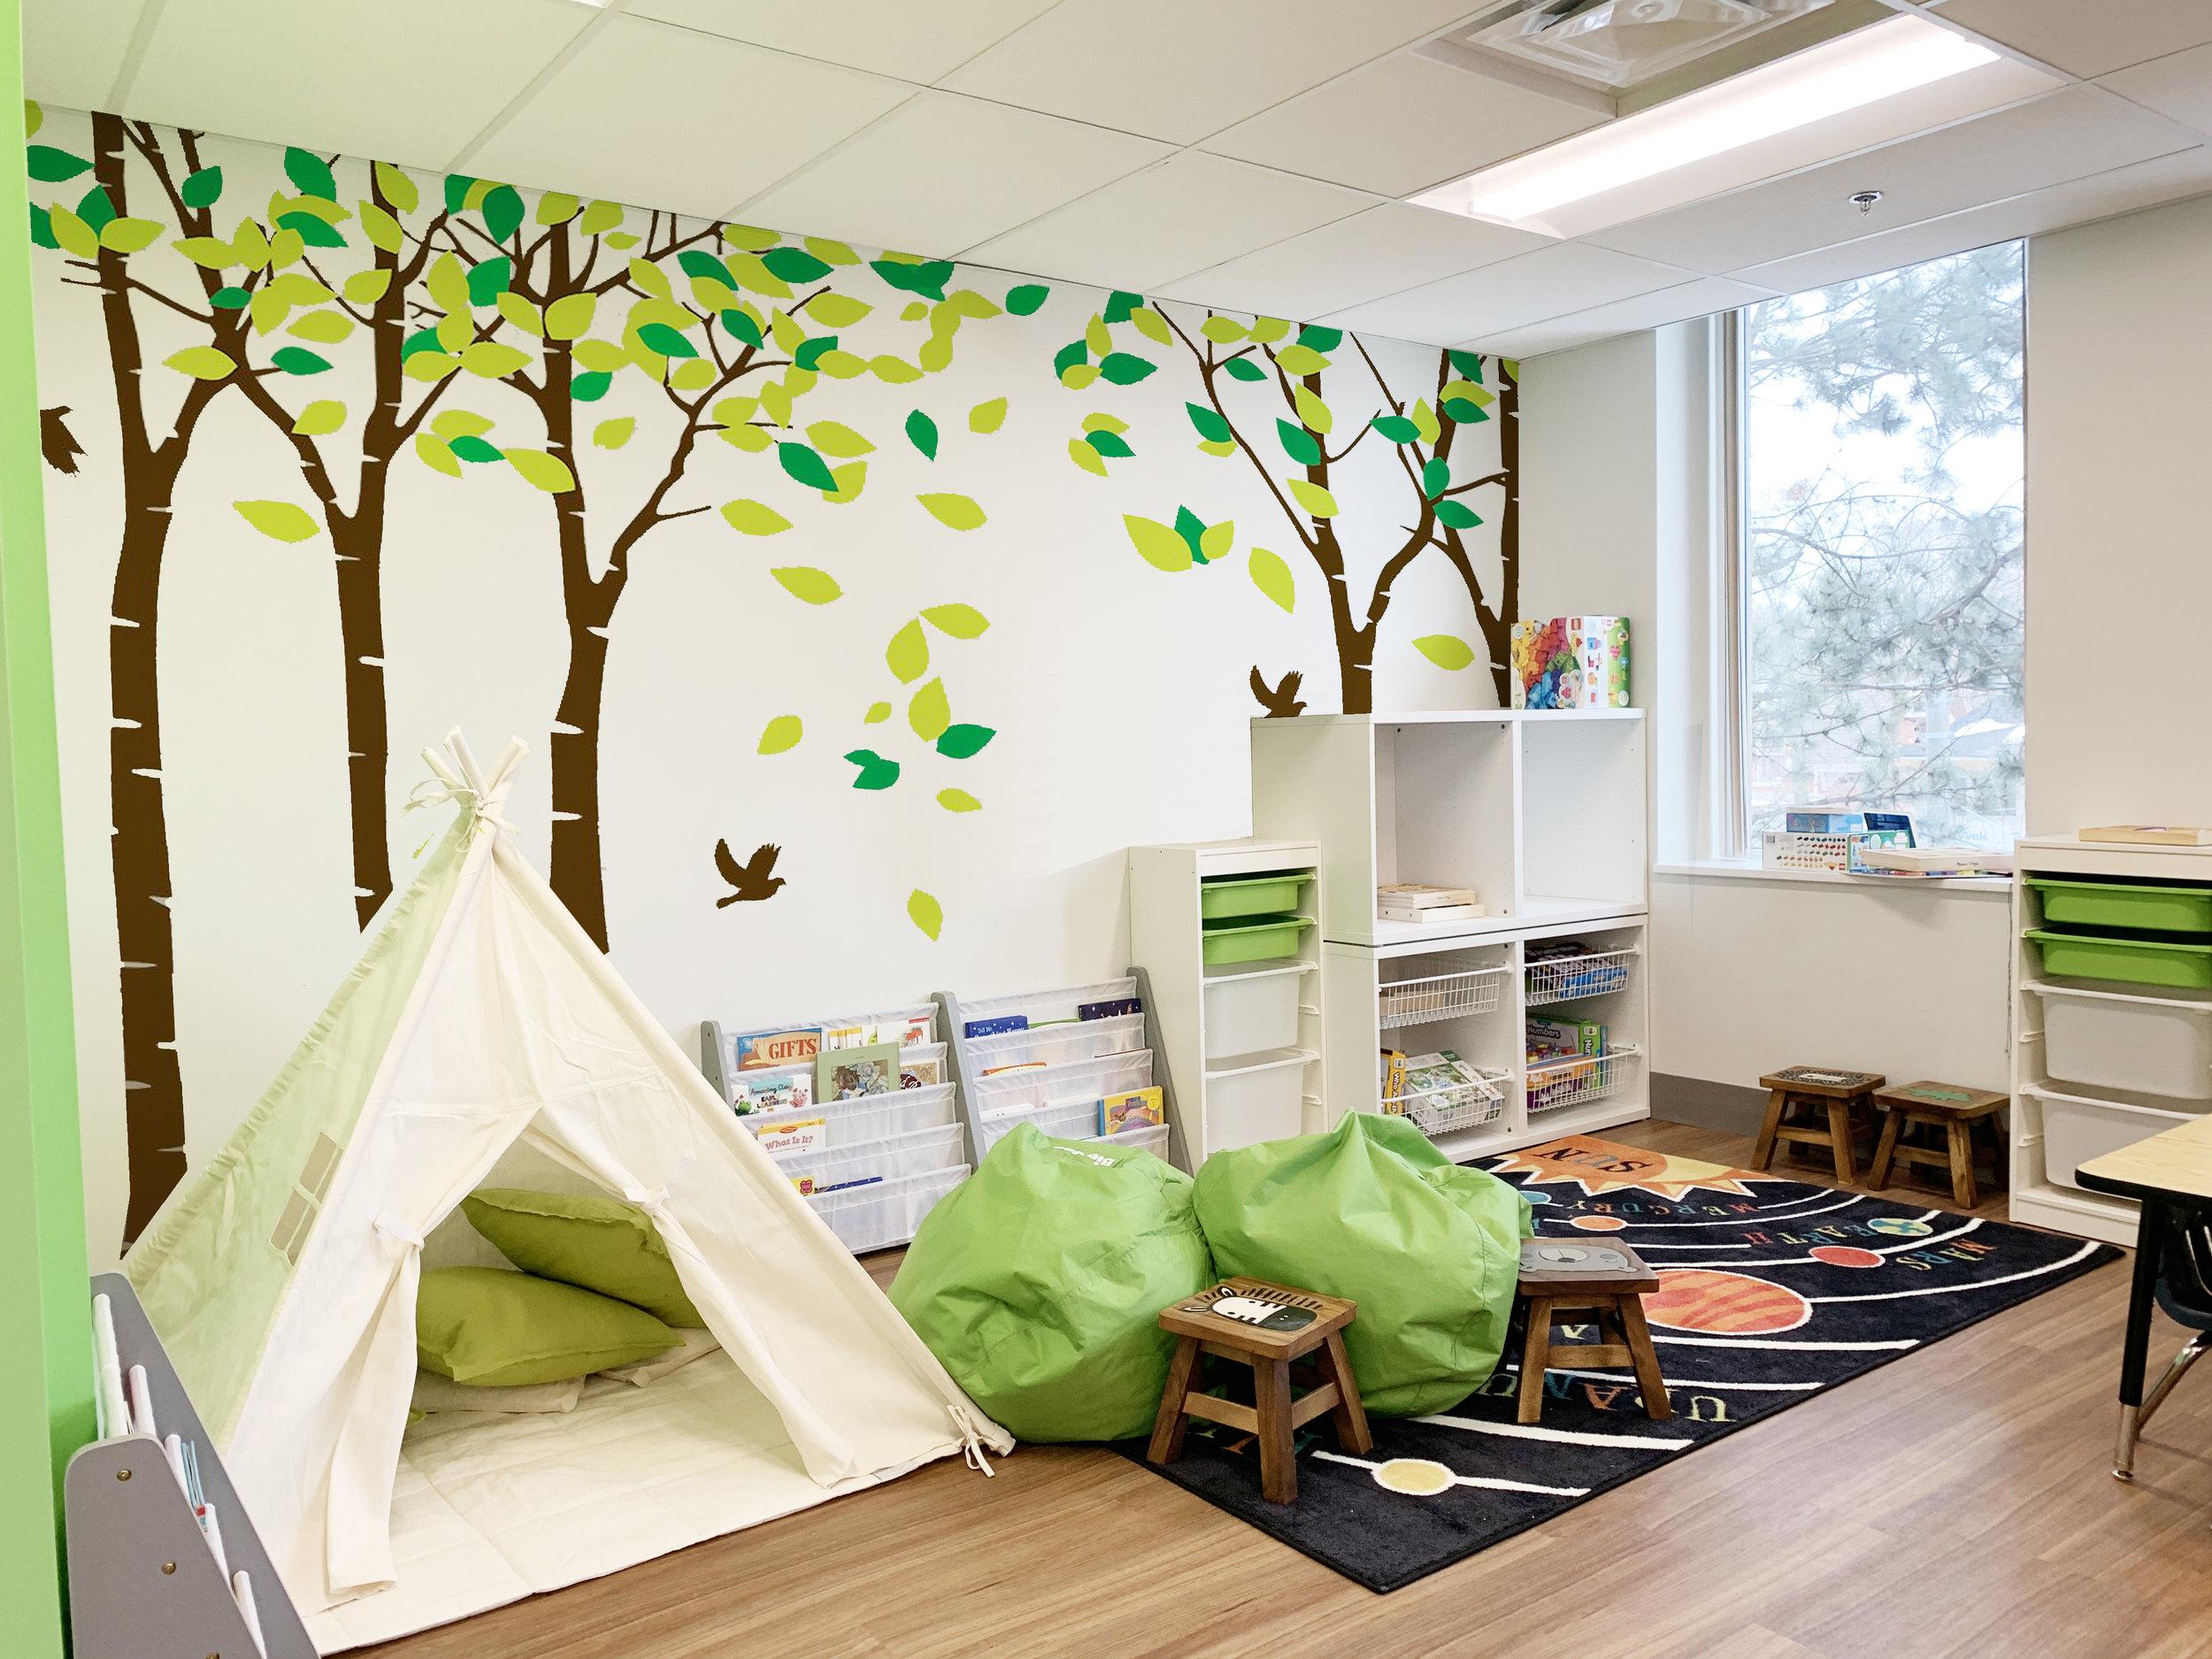 Canada_Toronto_Daycare_Design_architect_classroom_tent.jpg